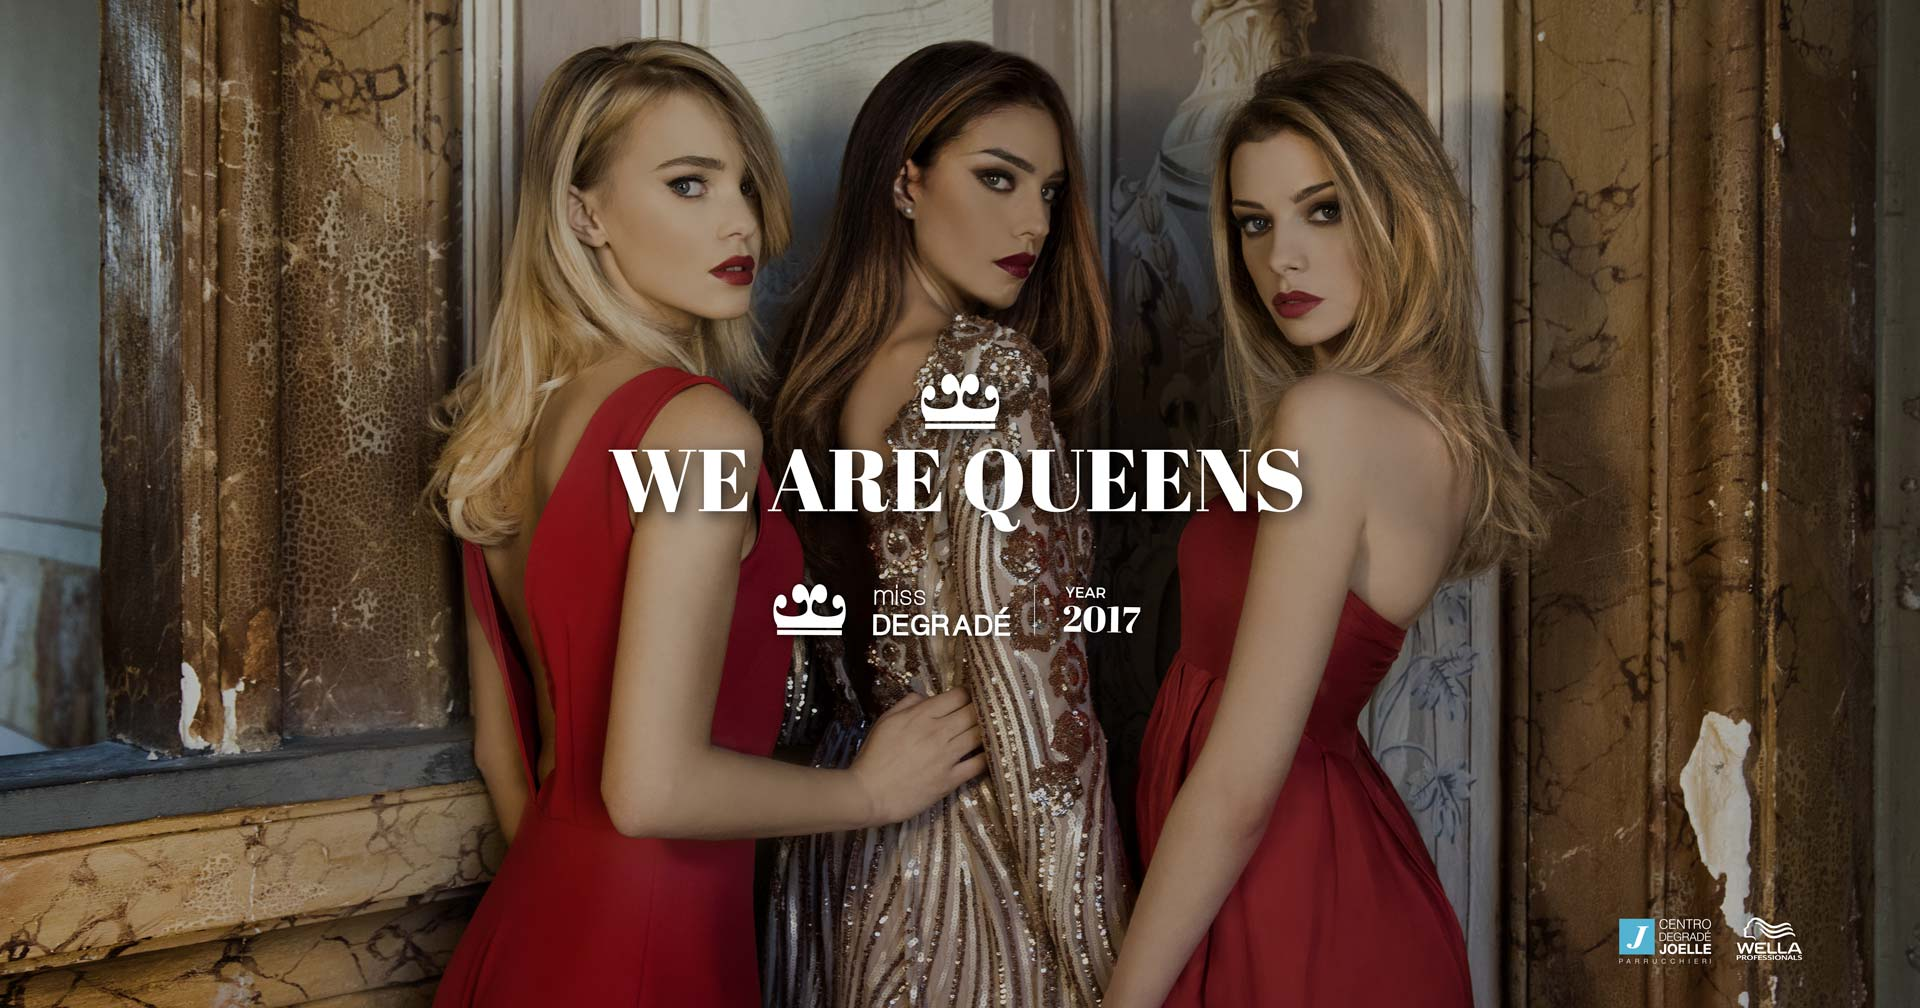 Centro Degradé Joelle sceglie 9 Bureau per la campagna Miss Degradé 2017